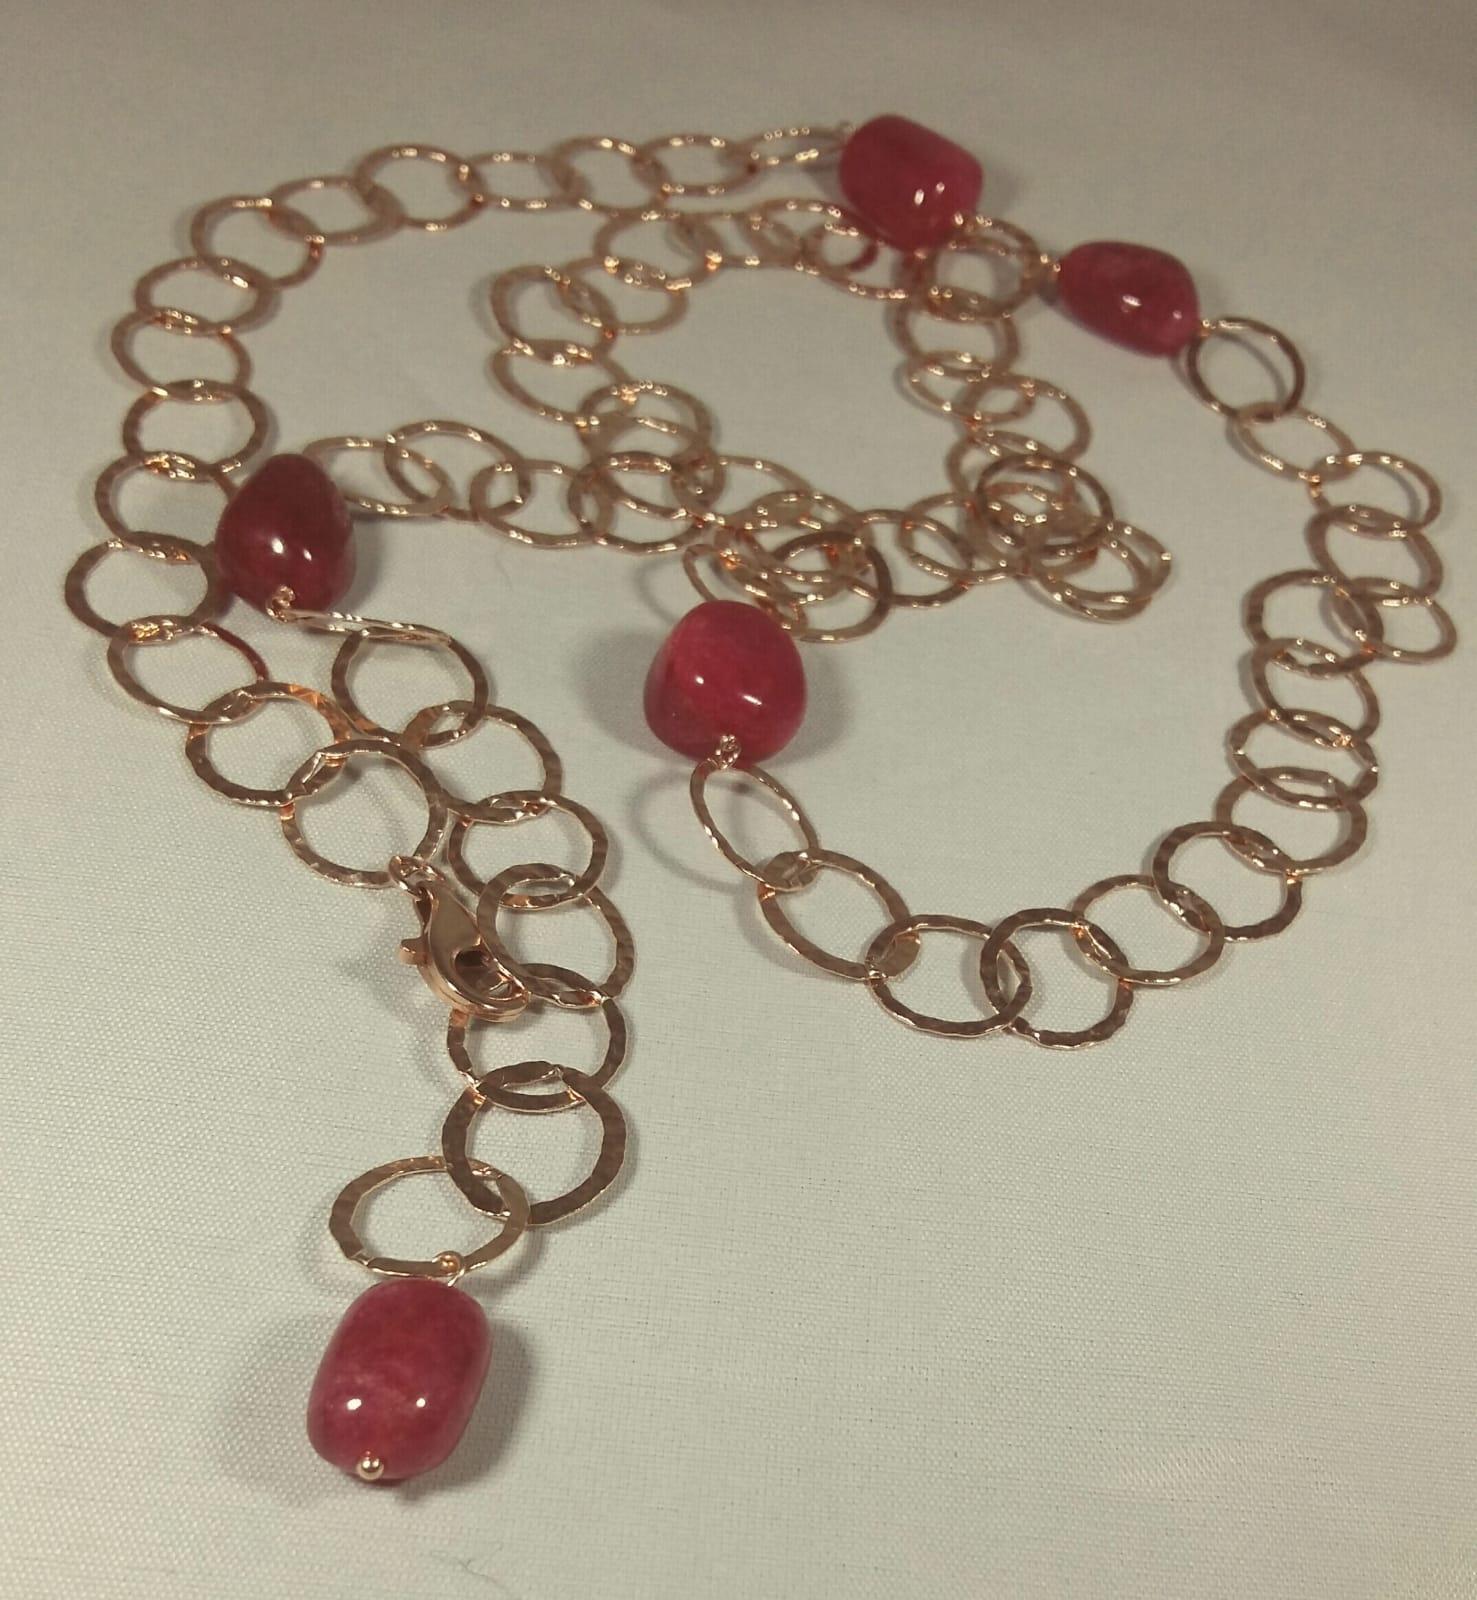 Collana lunga catena e sassi di rubino